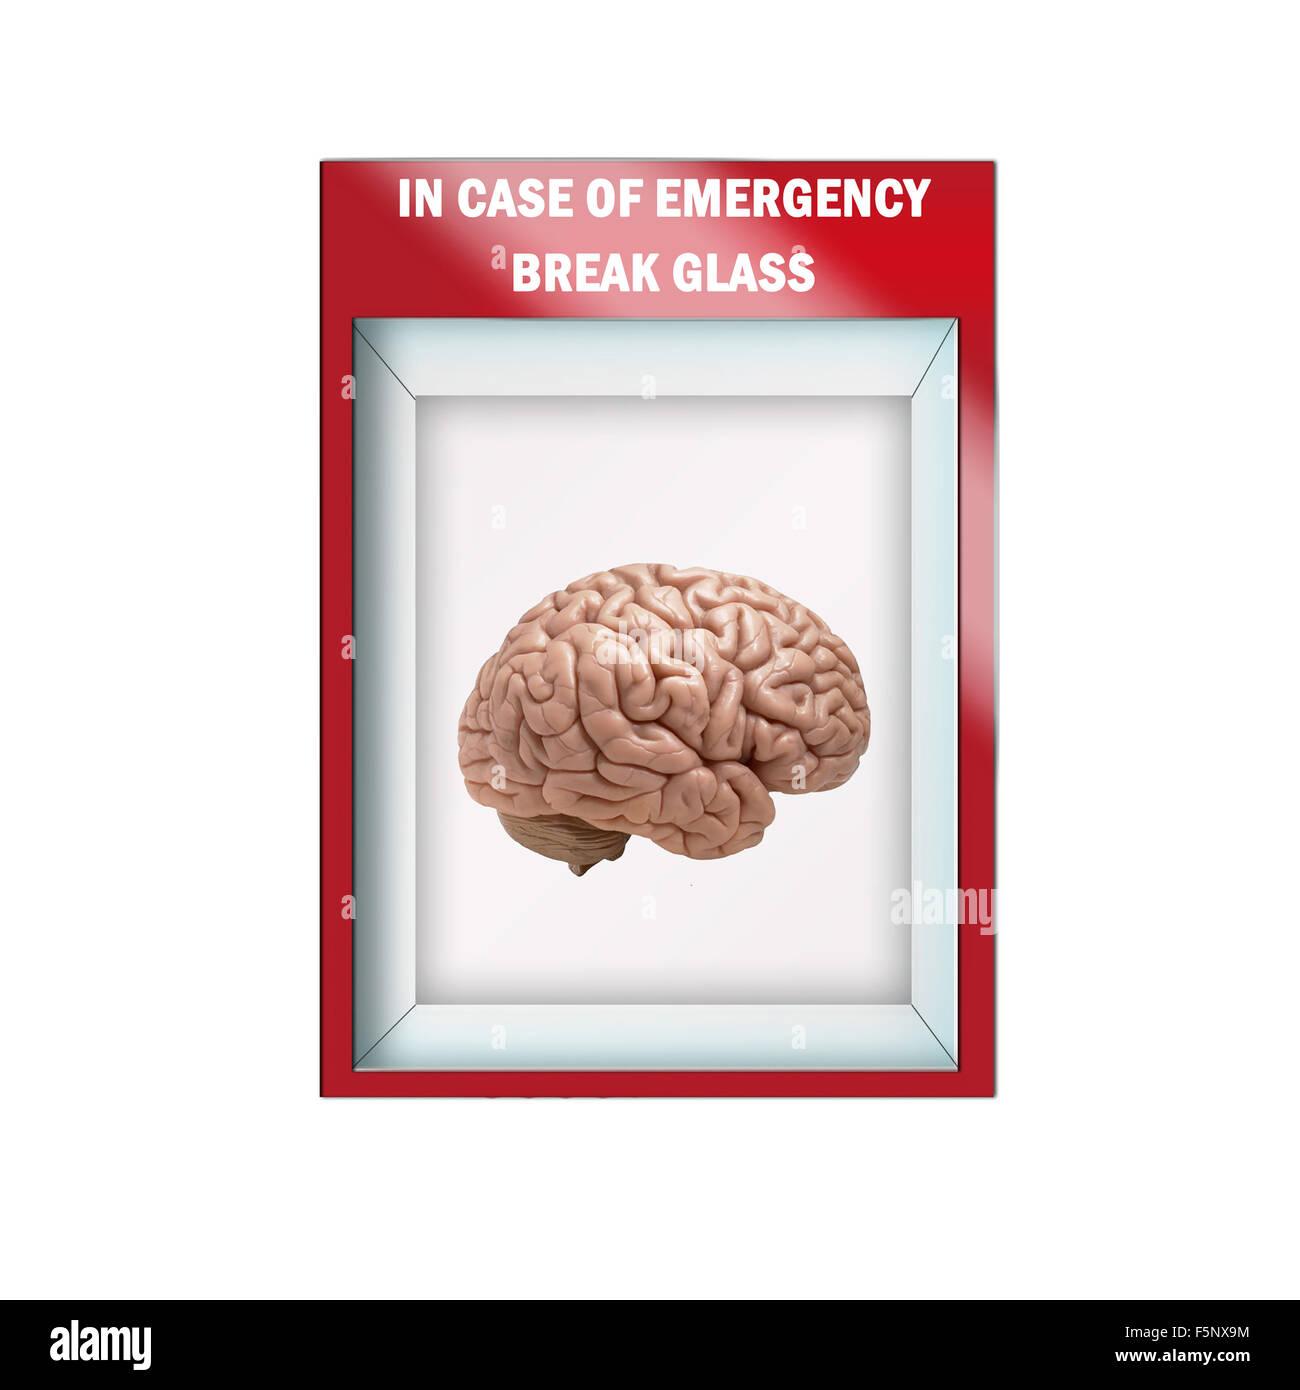 Mock up illustration -Emergency break glass case containing  human brain - Stock Image